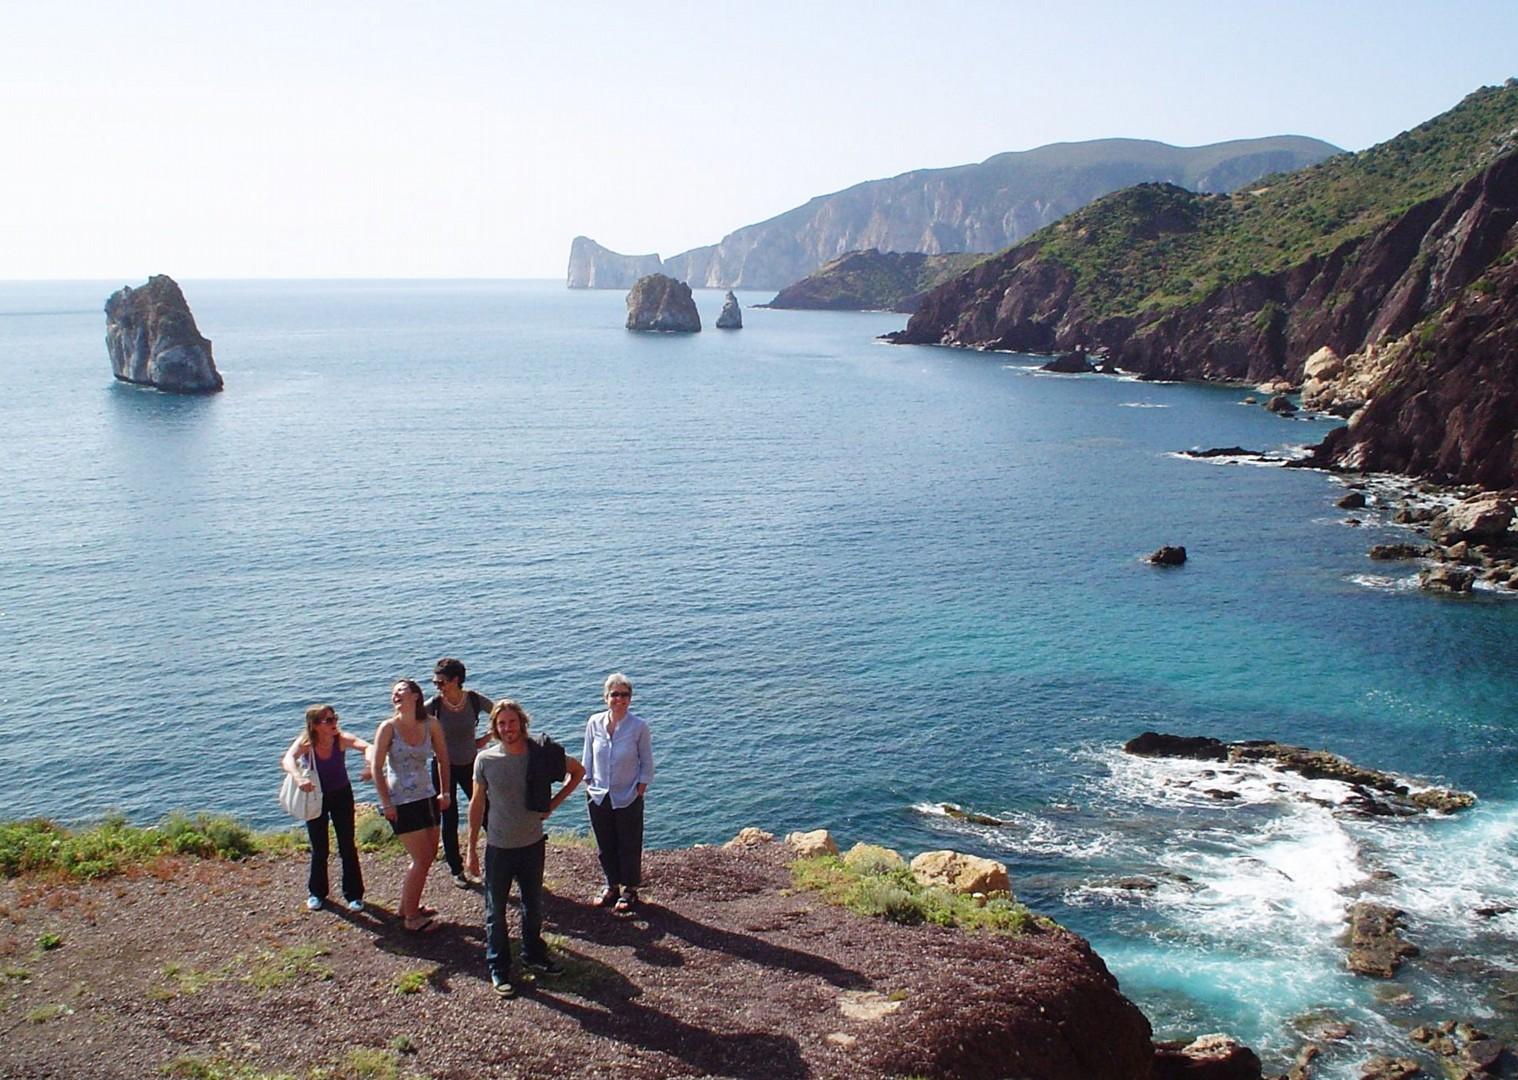 islands-sardinia-italy-coastal-cycling.jpg - Italy - Sardinia - Island Flavours - Leisure Cycling